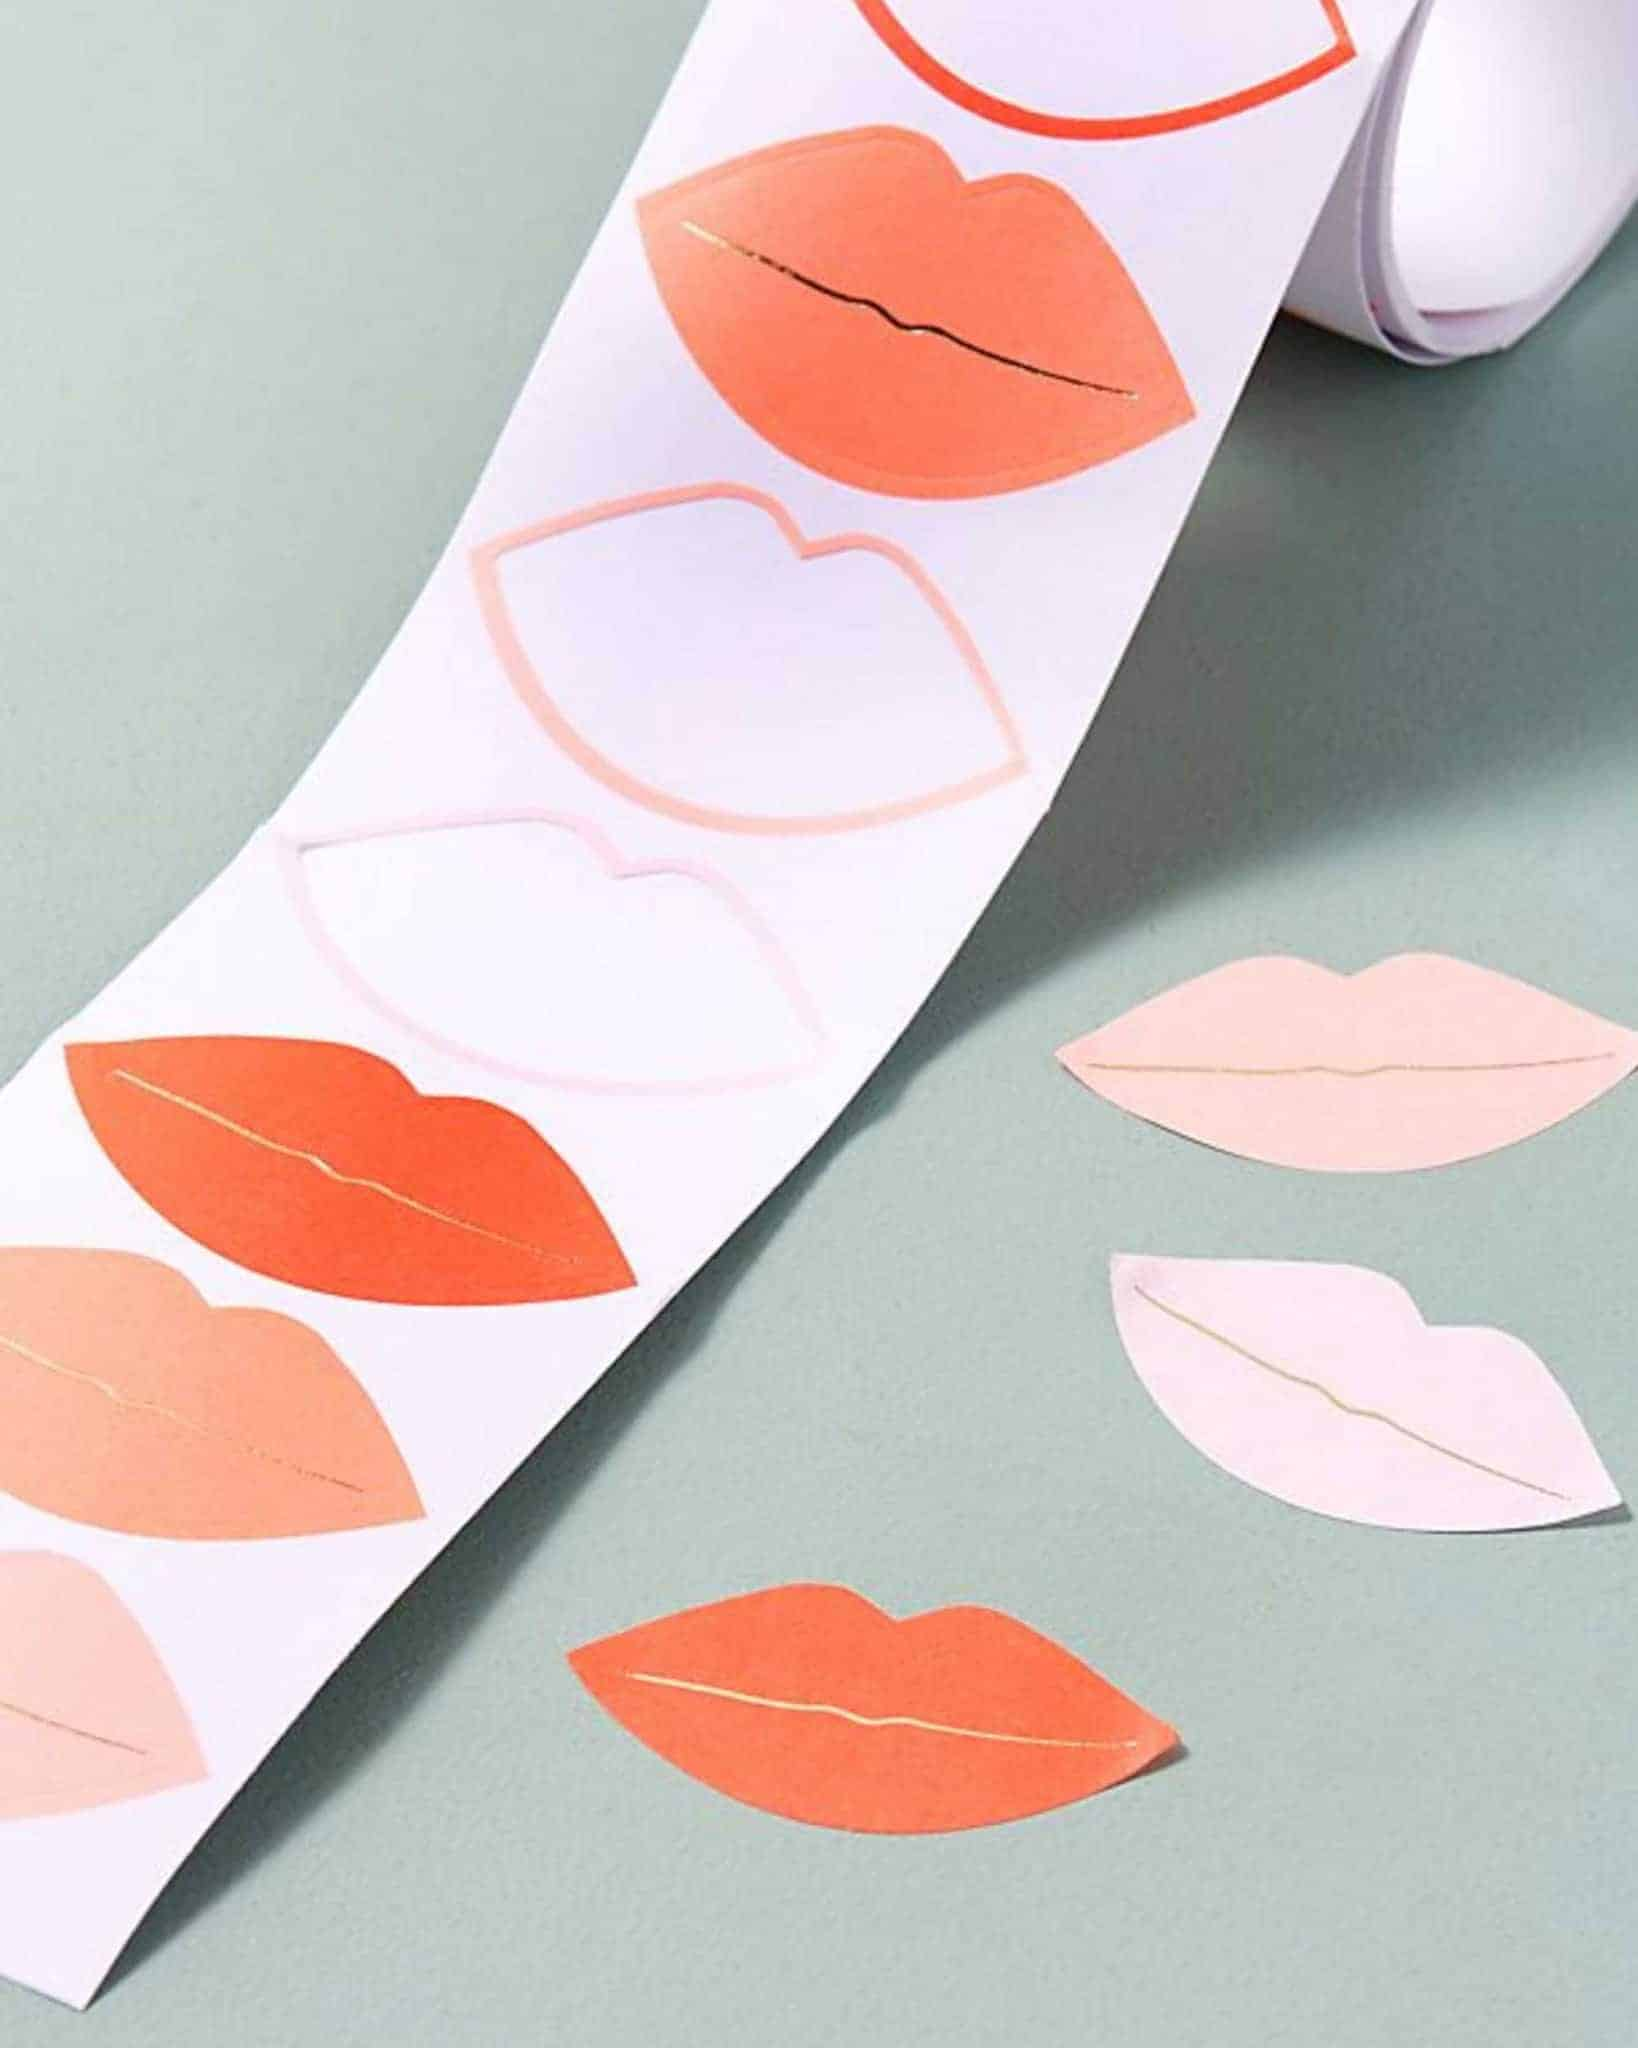 favourite picks Valentine's Day Lip Stickers from Anthropologie